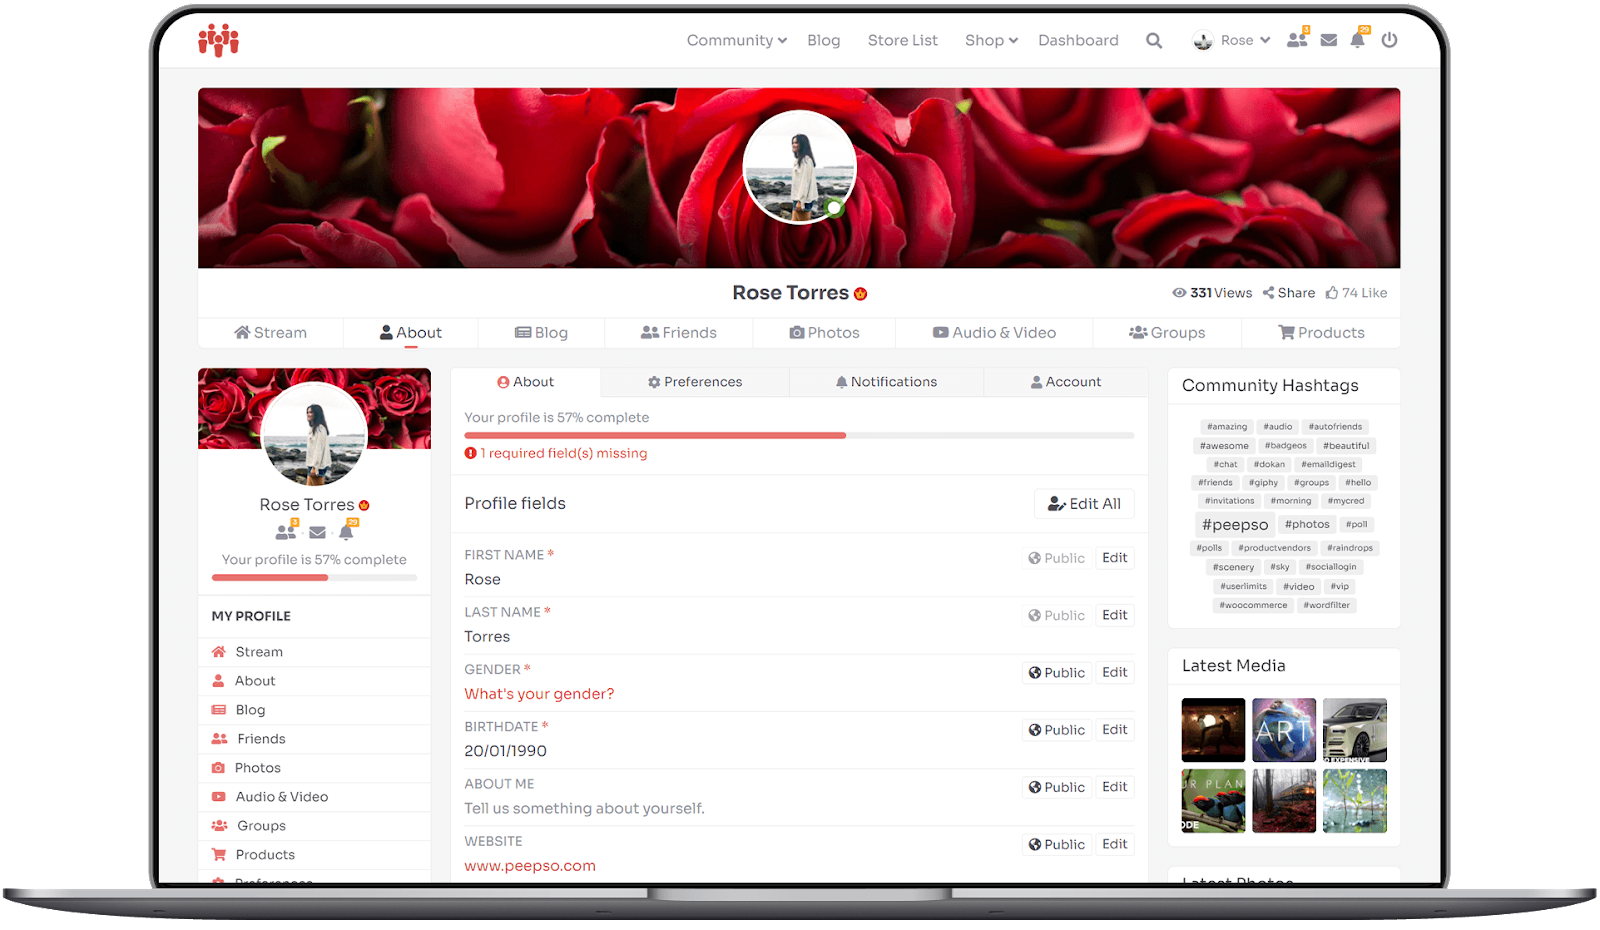 Peepso's sample user profile page